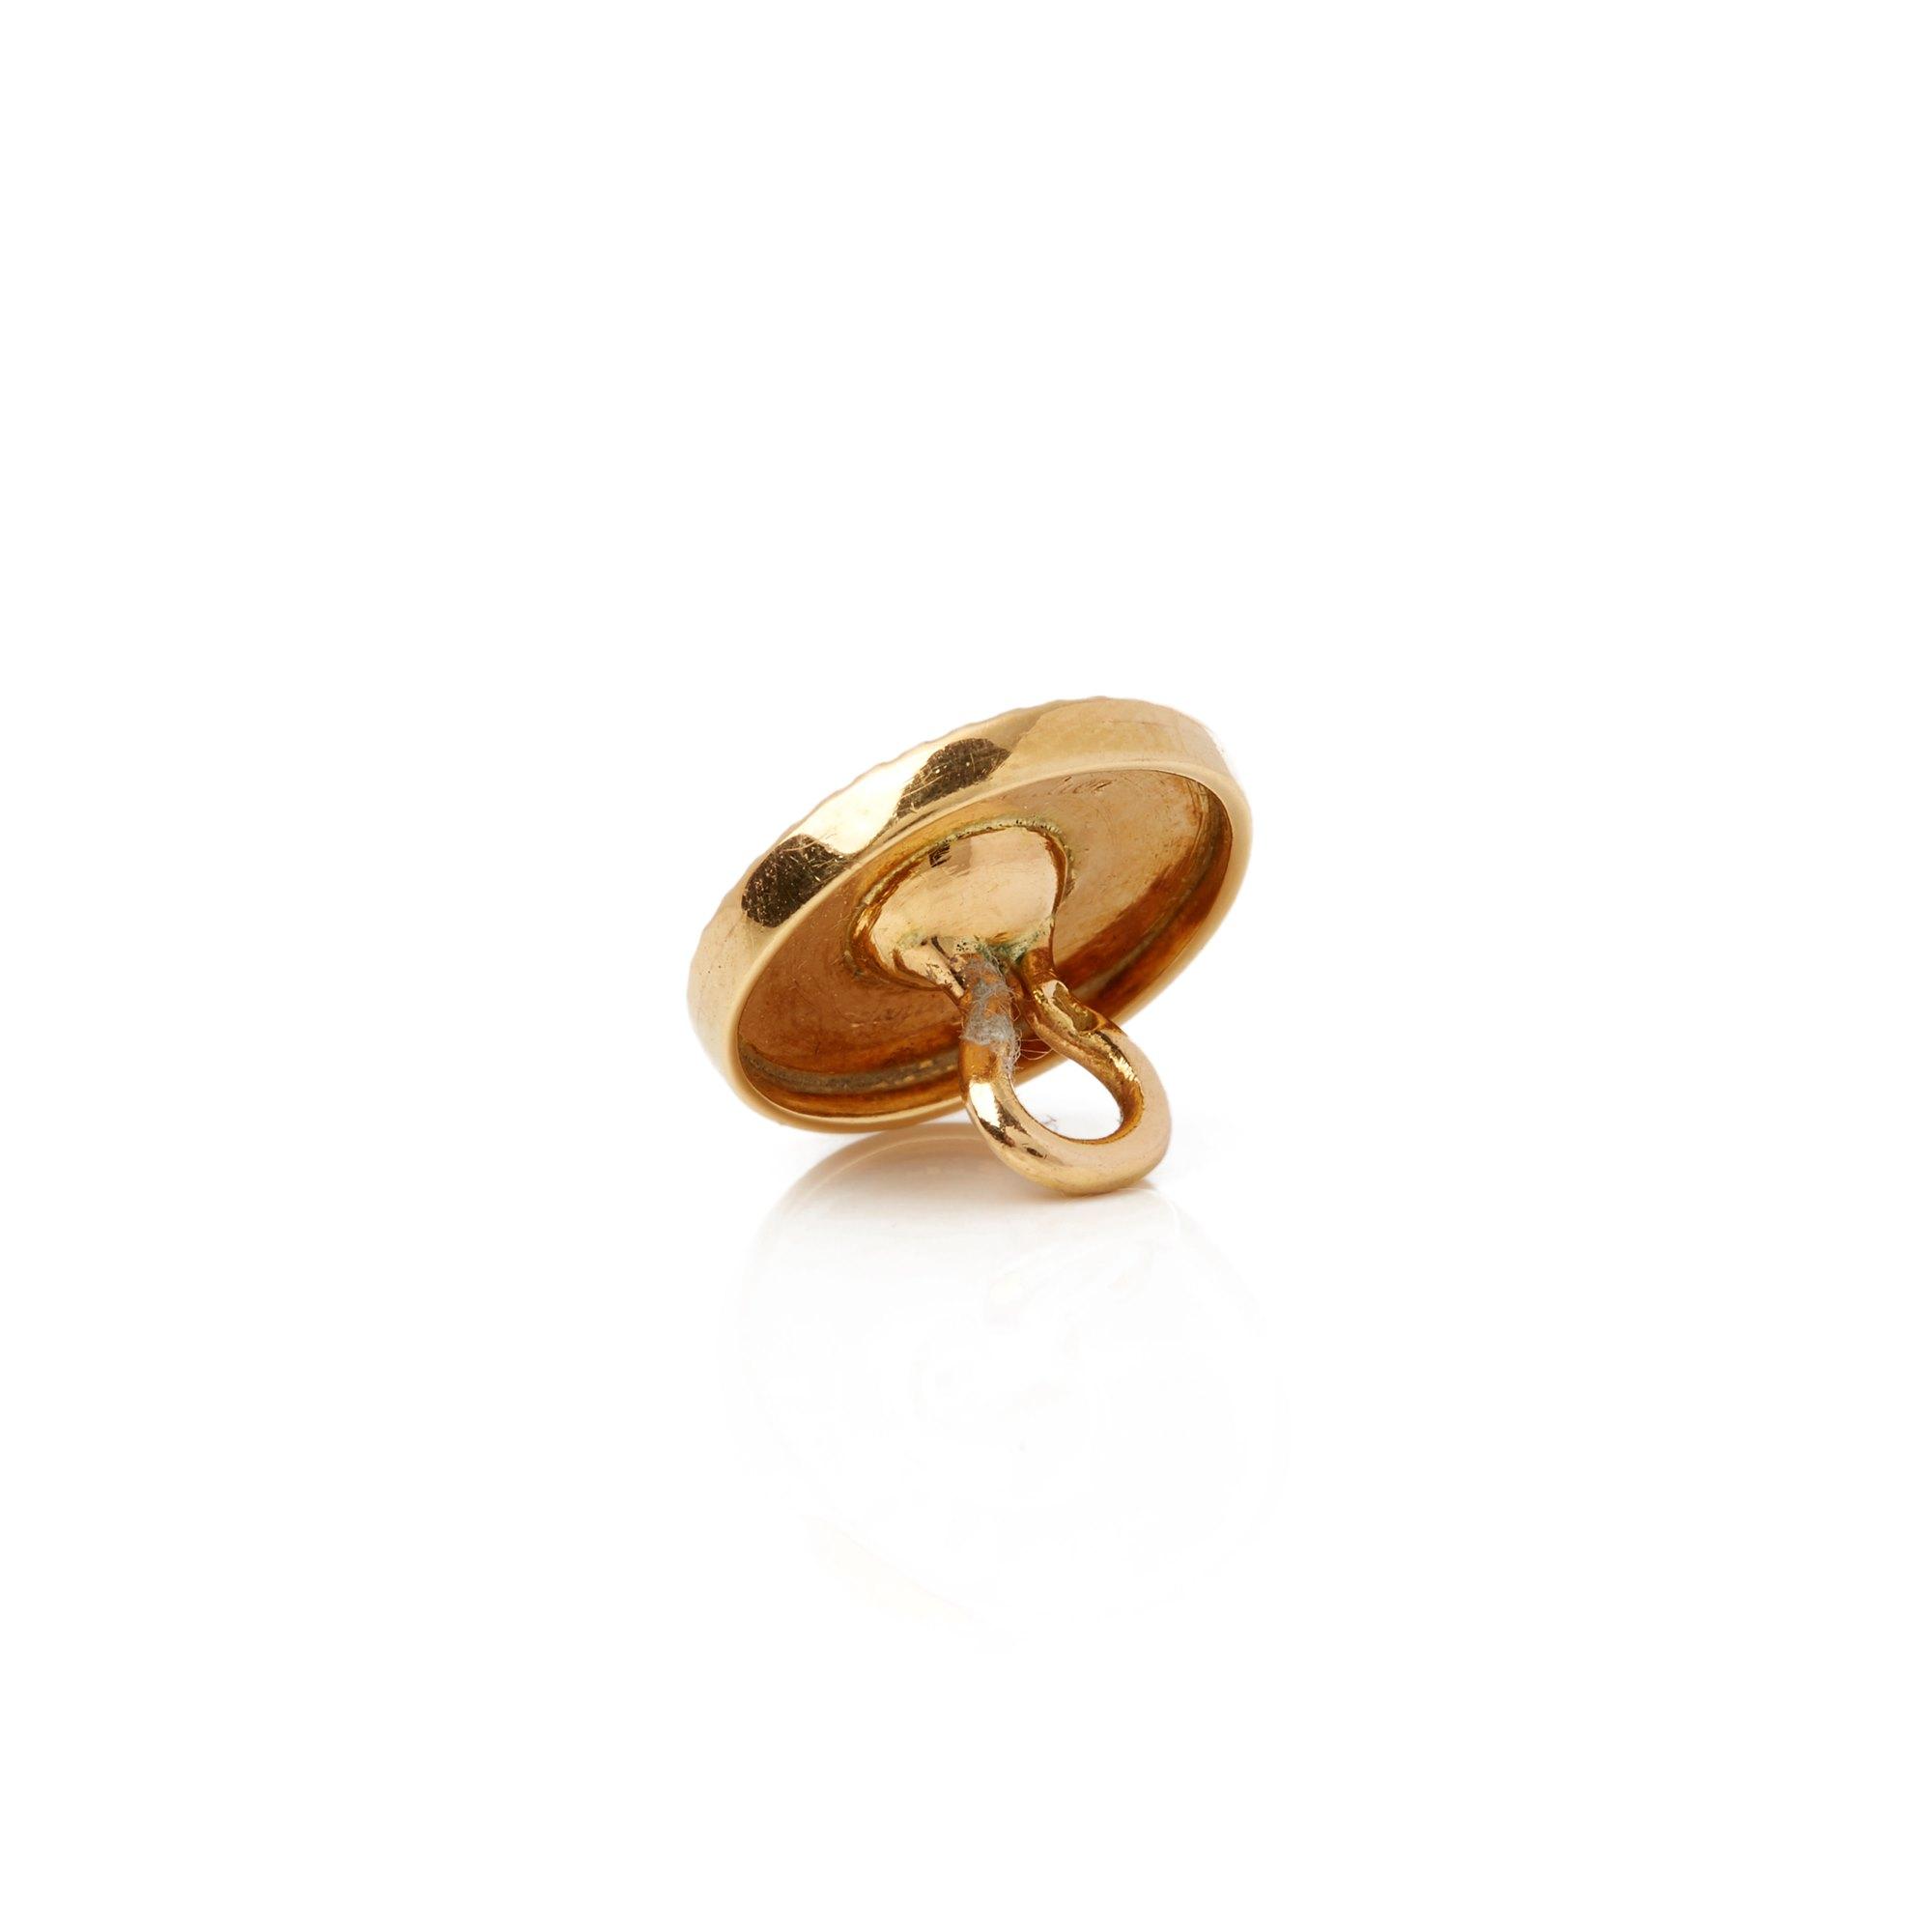 Cartier 18k Yellow Gold Cufflink and Dress Stud Suite